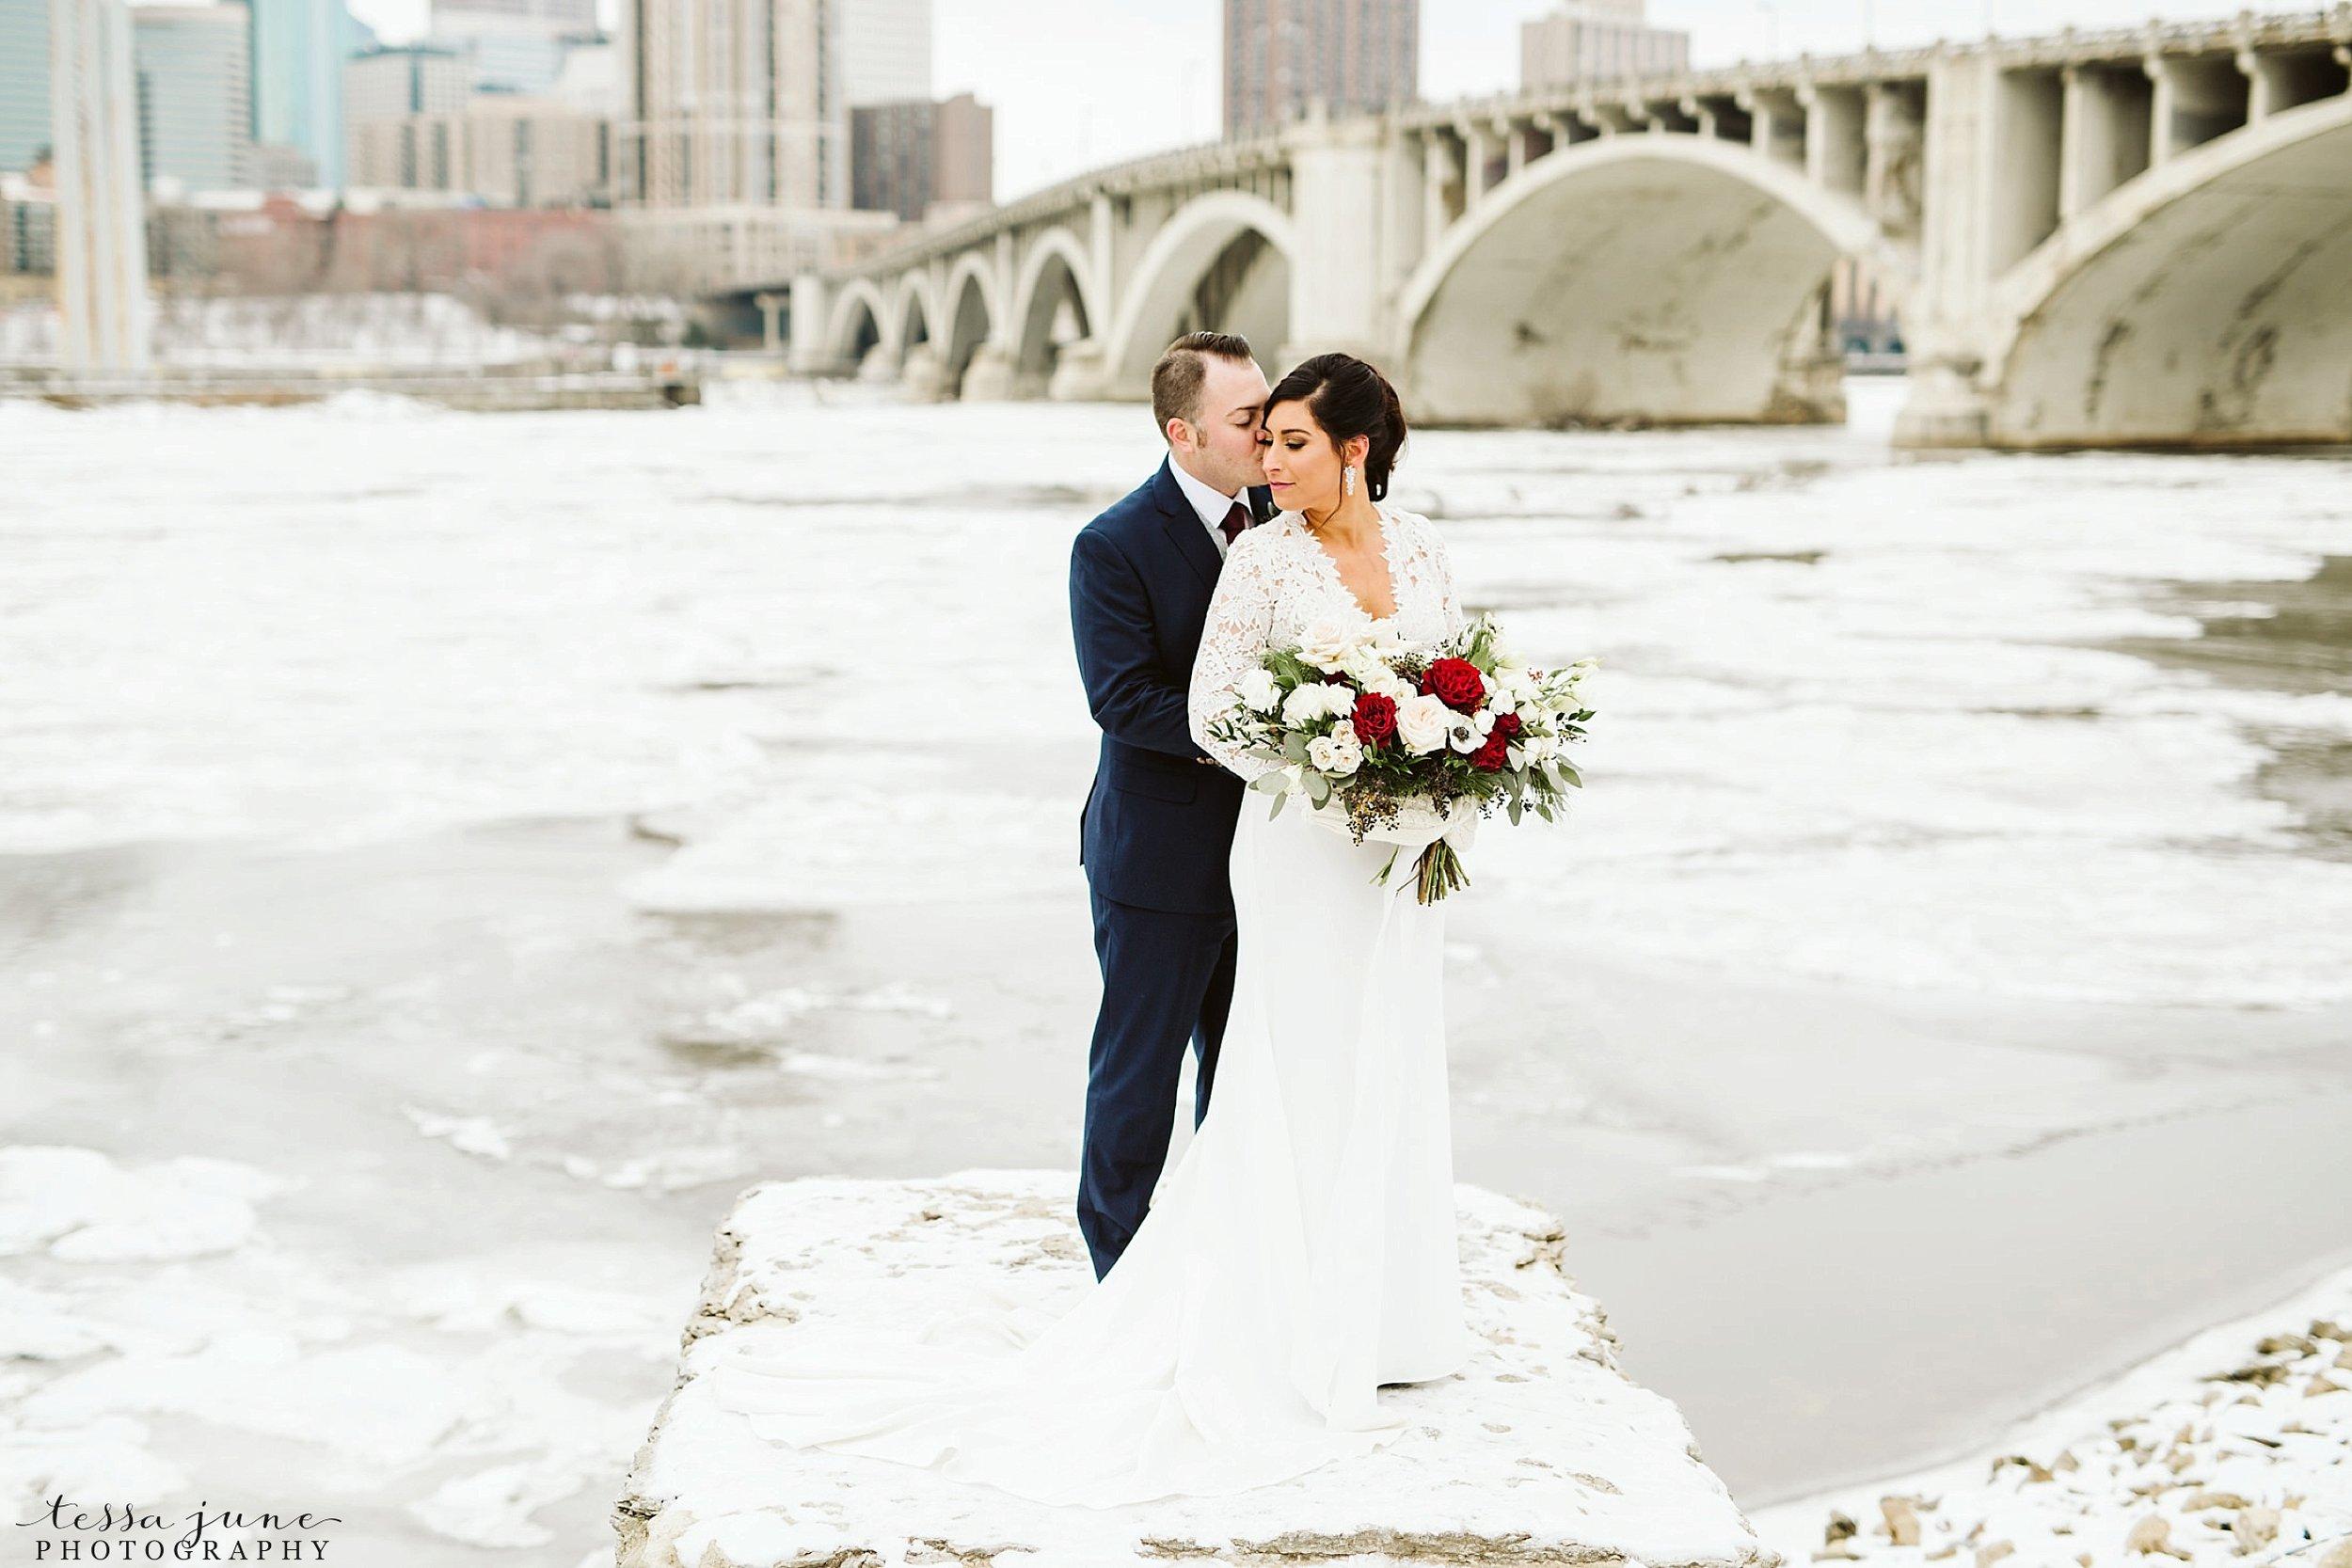 minneapolis-event-center-winter-romantic-snow-wedding-december-91.jpg